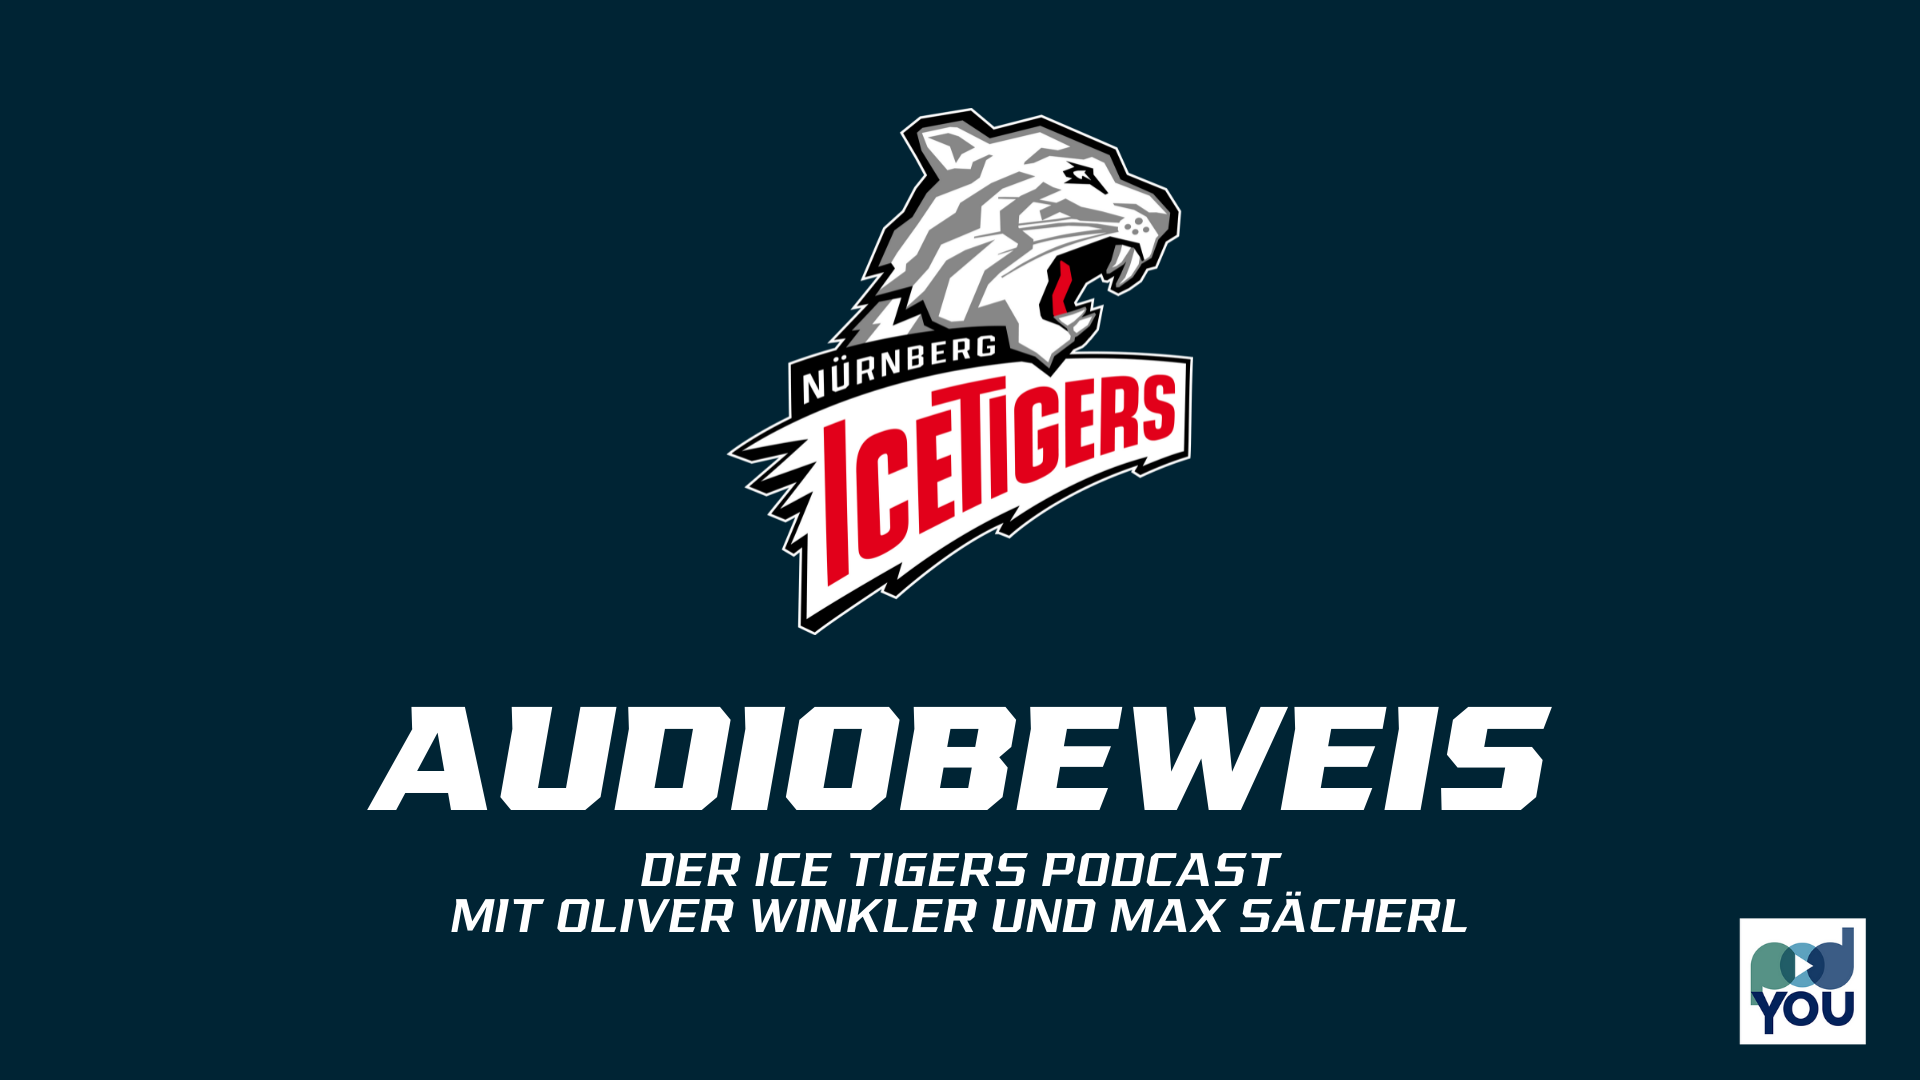 Audiobeweis – Der Ice Tigers Podcast